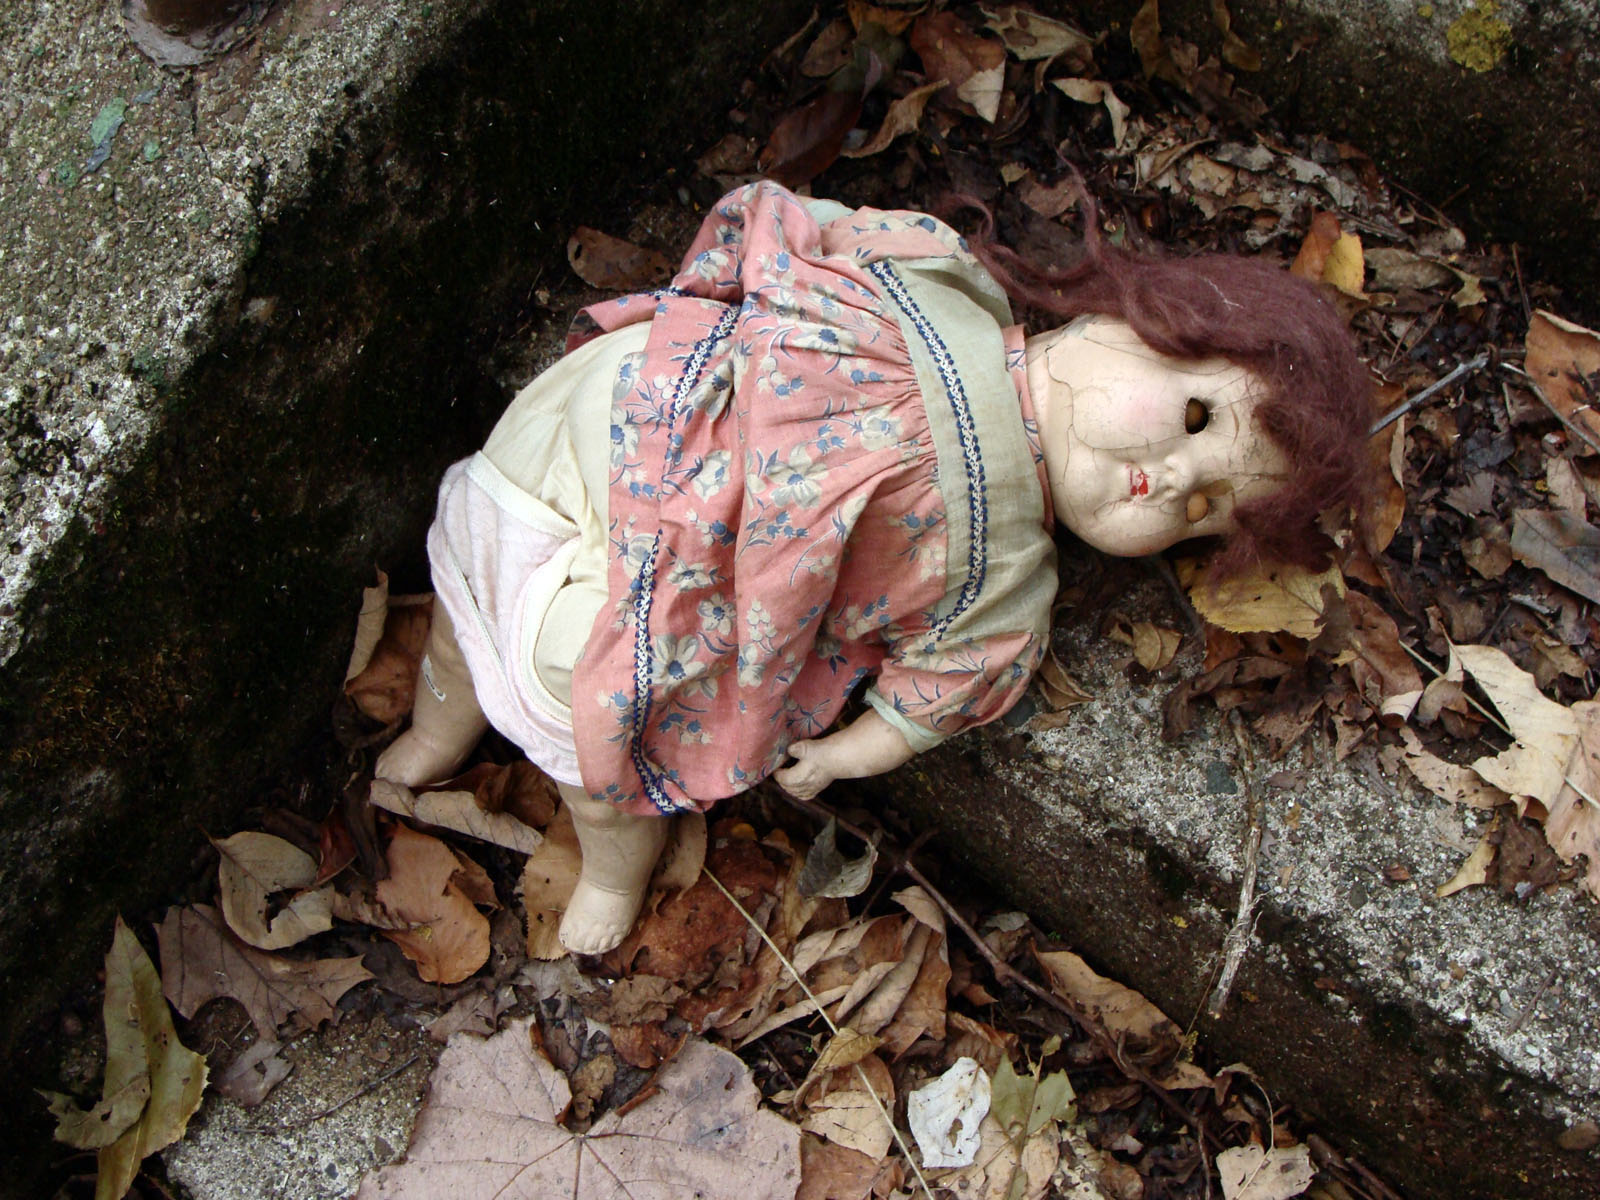 Doll stepsedited 07491 copy.jpg